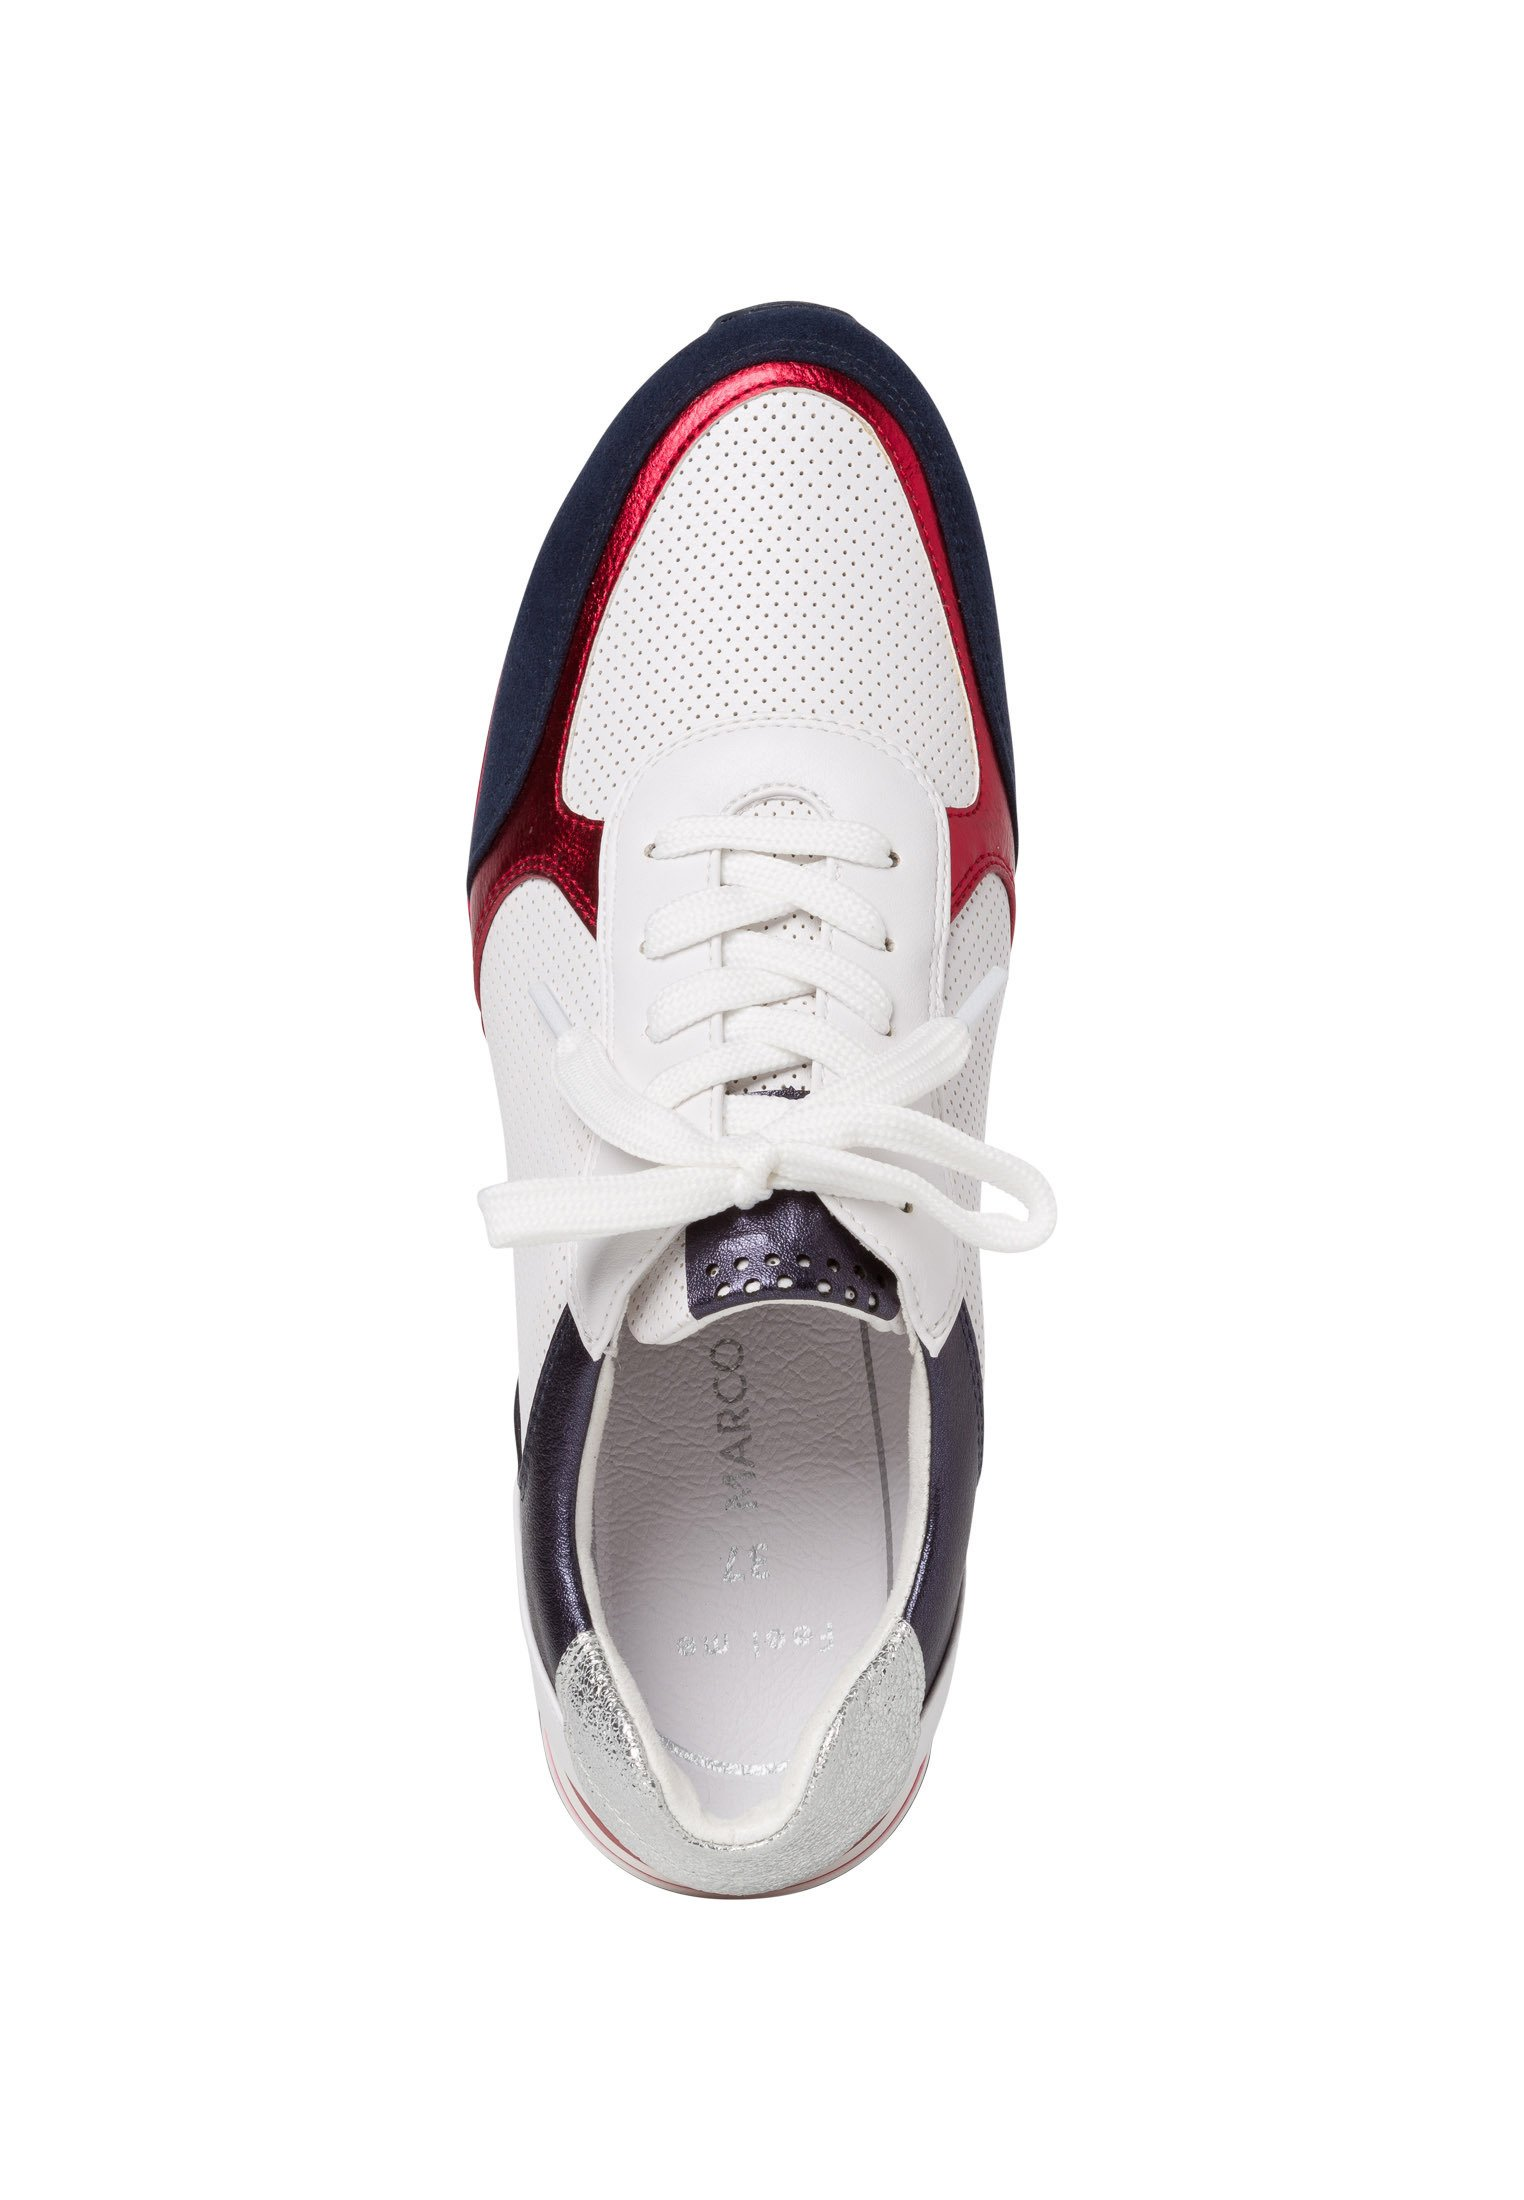 Marco Tozzi Sneaker - Sneakers White/navy